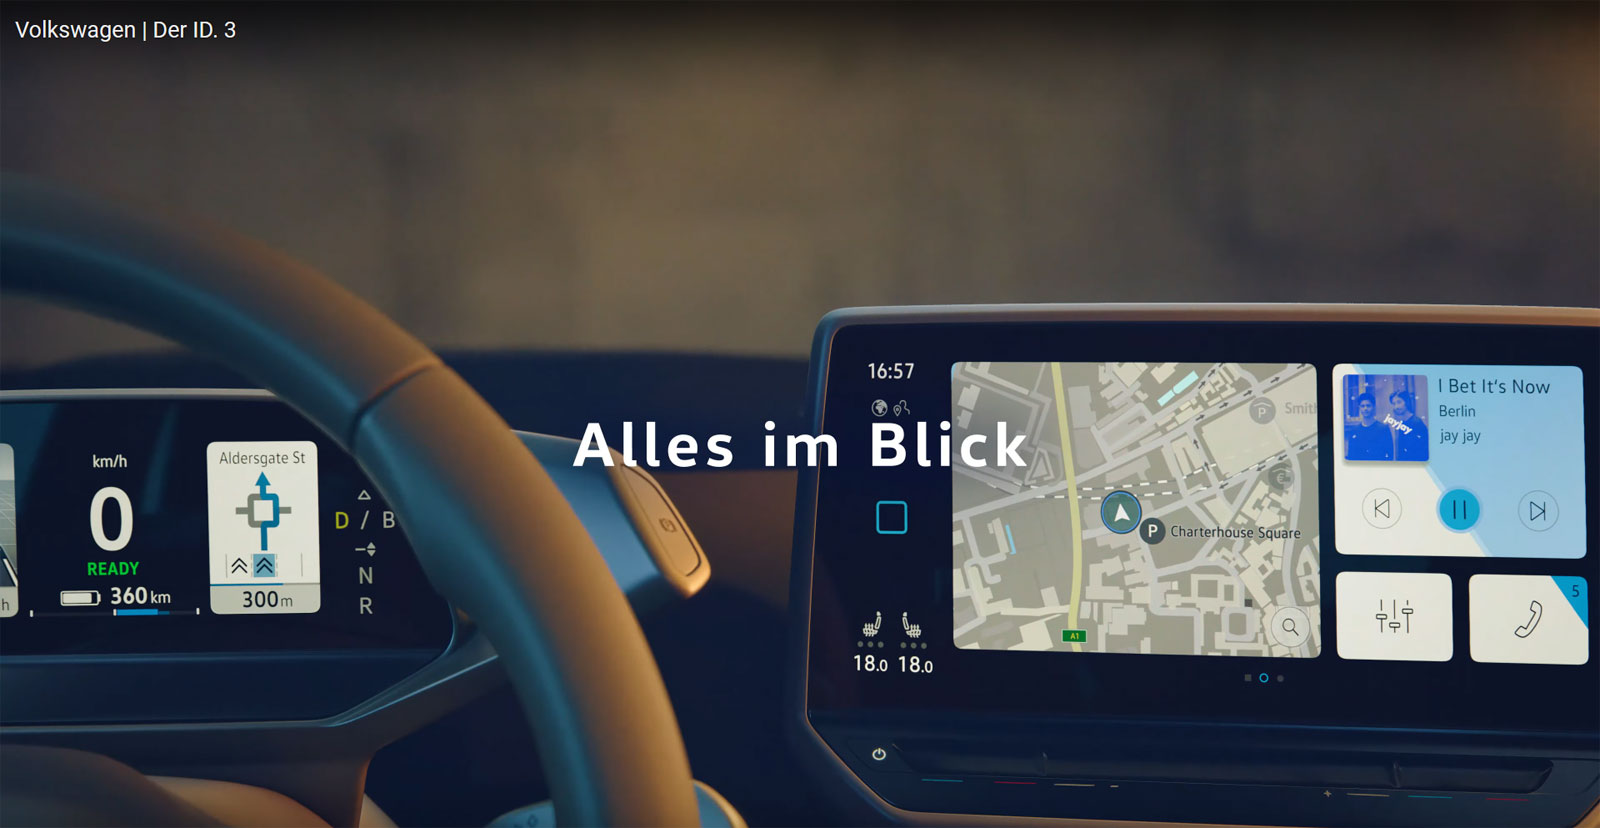 VW ID.3 Cockpit Leak